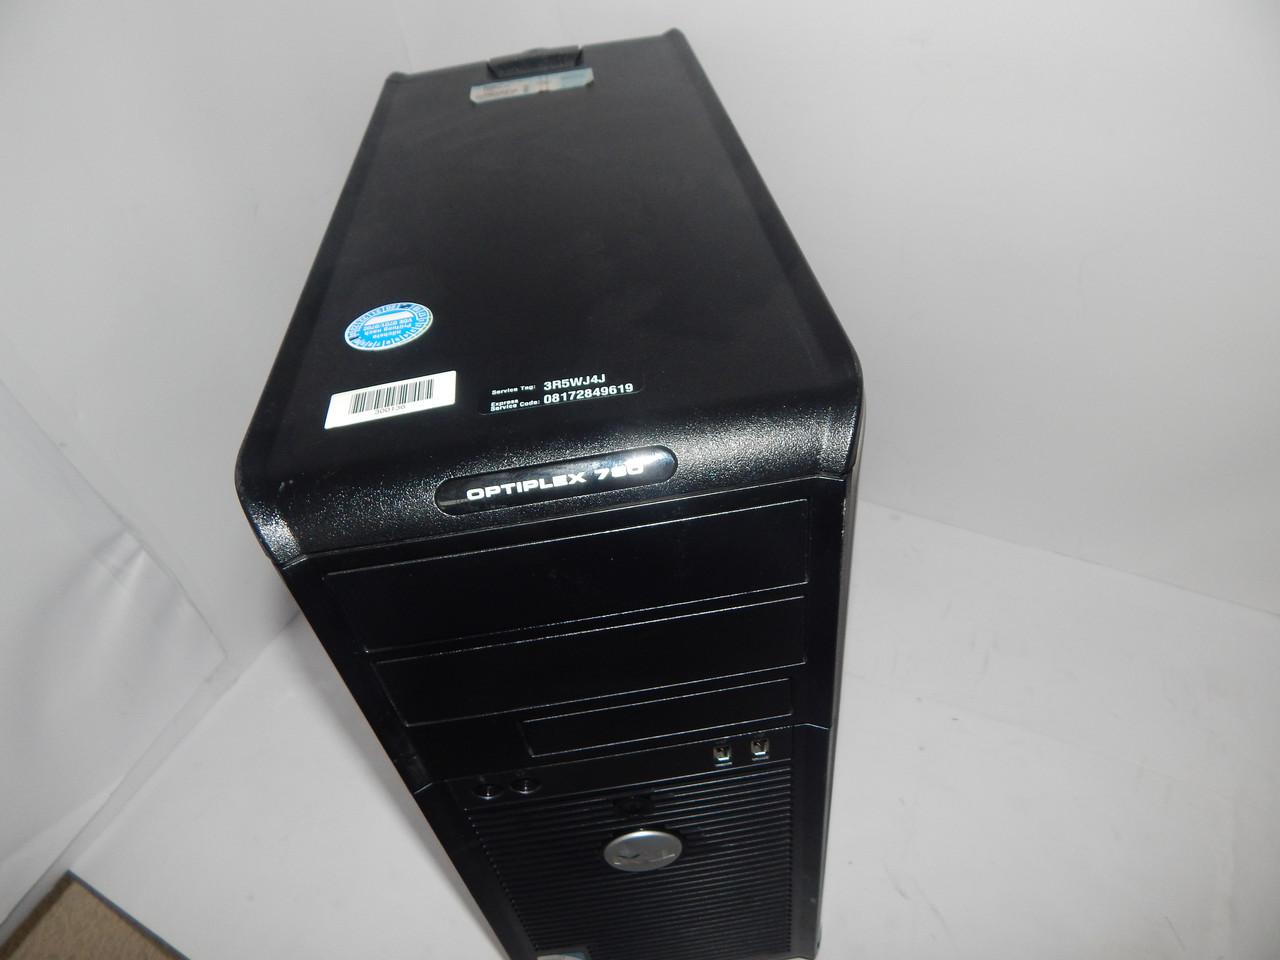 4-х ядерный системный блок компьютер проц Q6600 4ГБ DDR3 HDD 500 GB